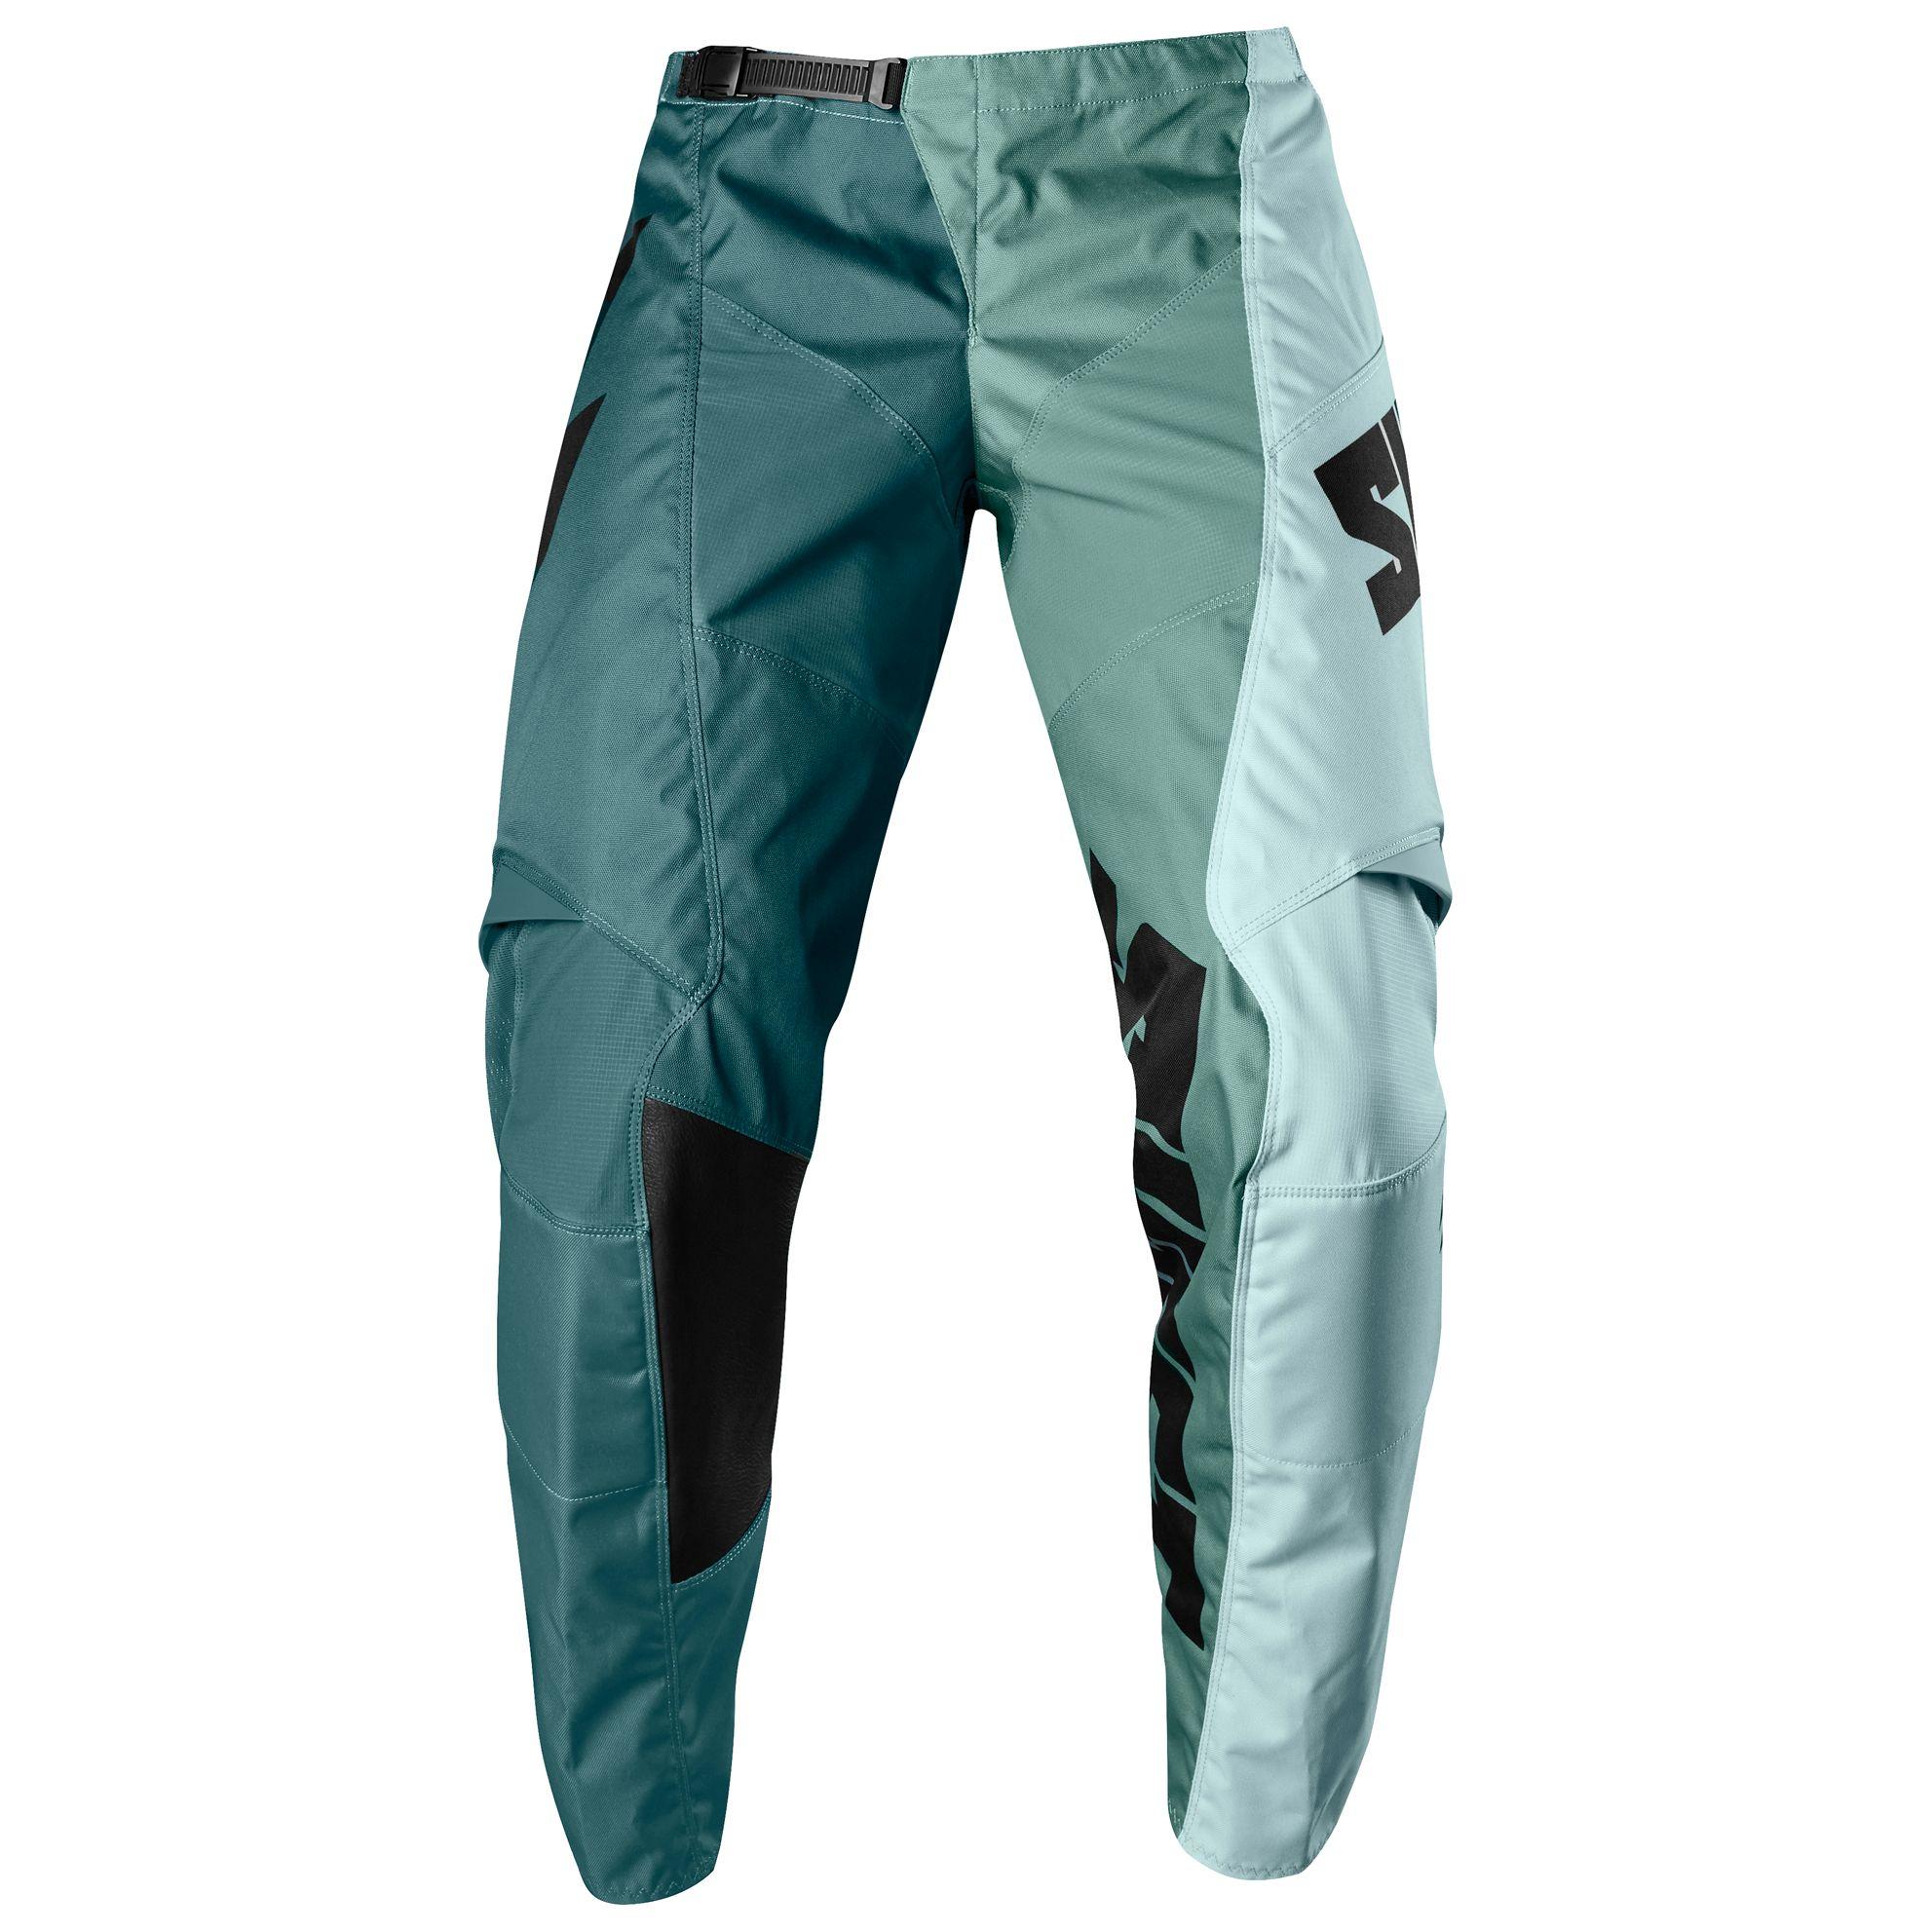 Pantalon cross Shift WHIT3 LABEL TARMAC teal  2018